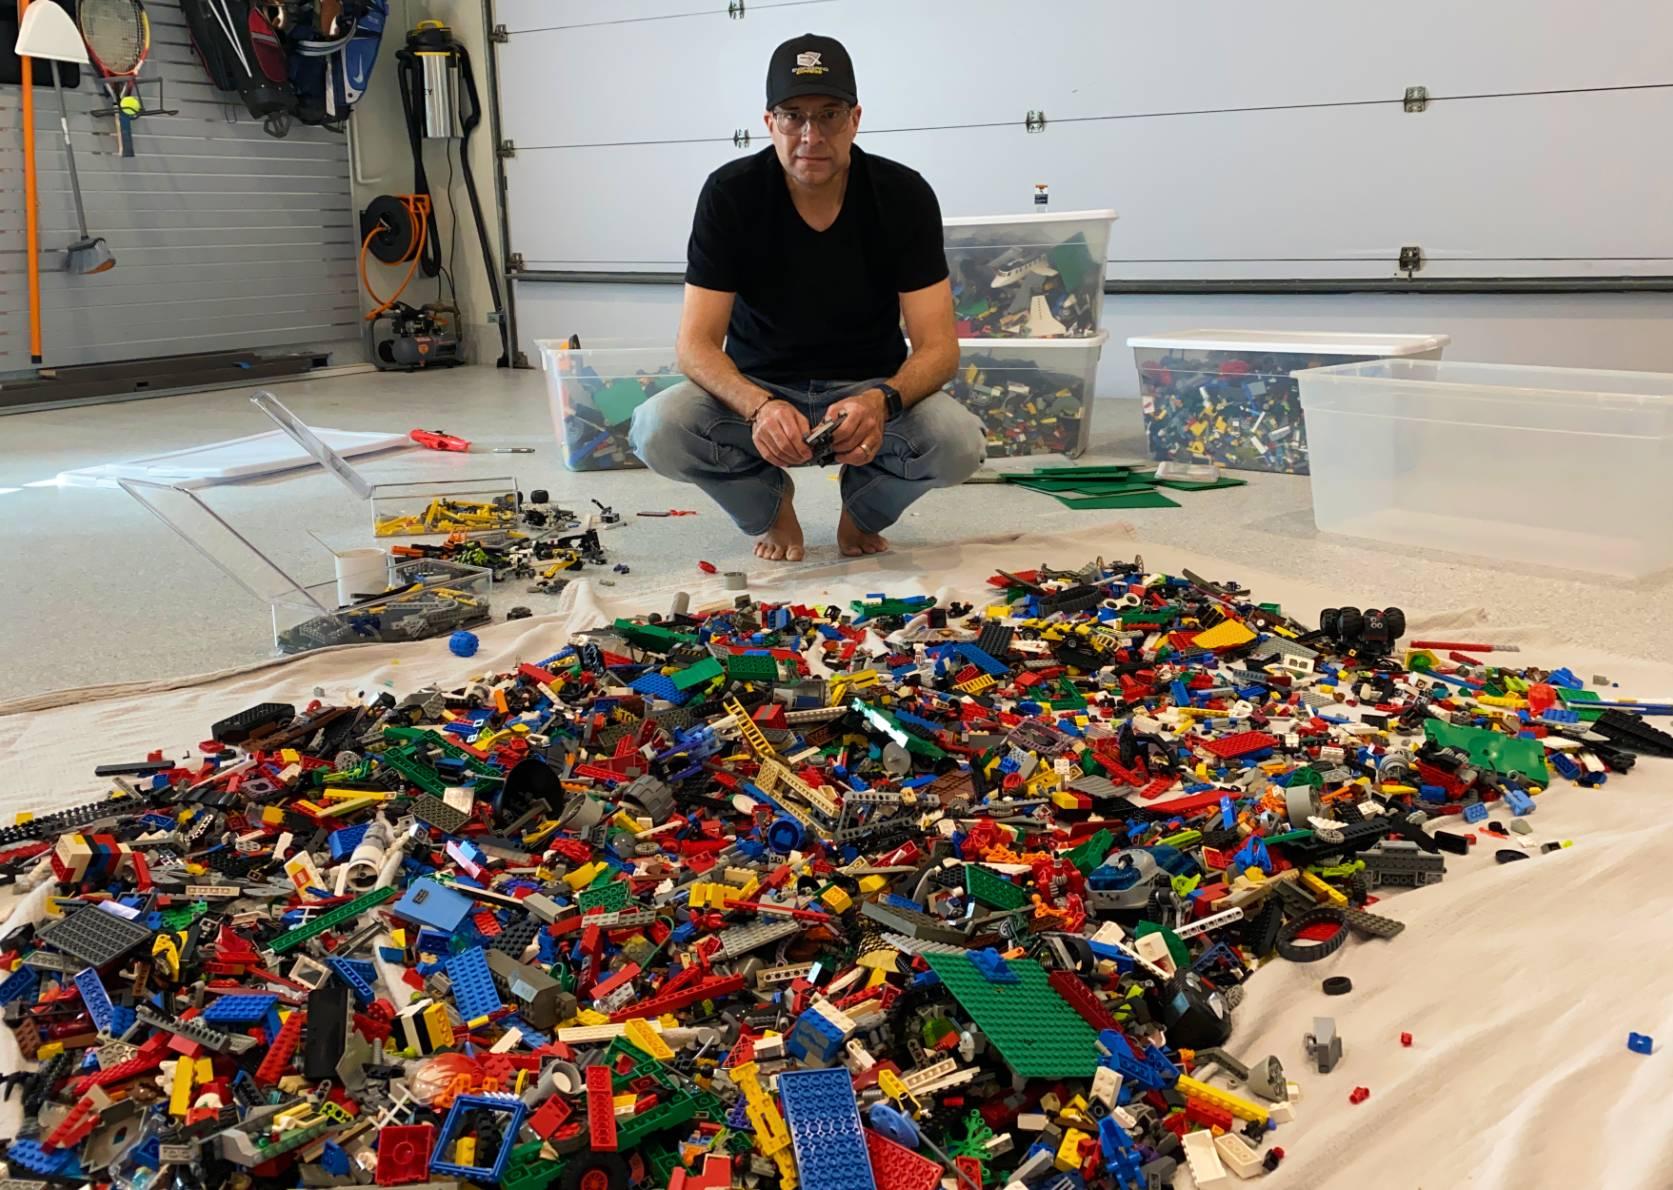 Frank sorting through Legos